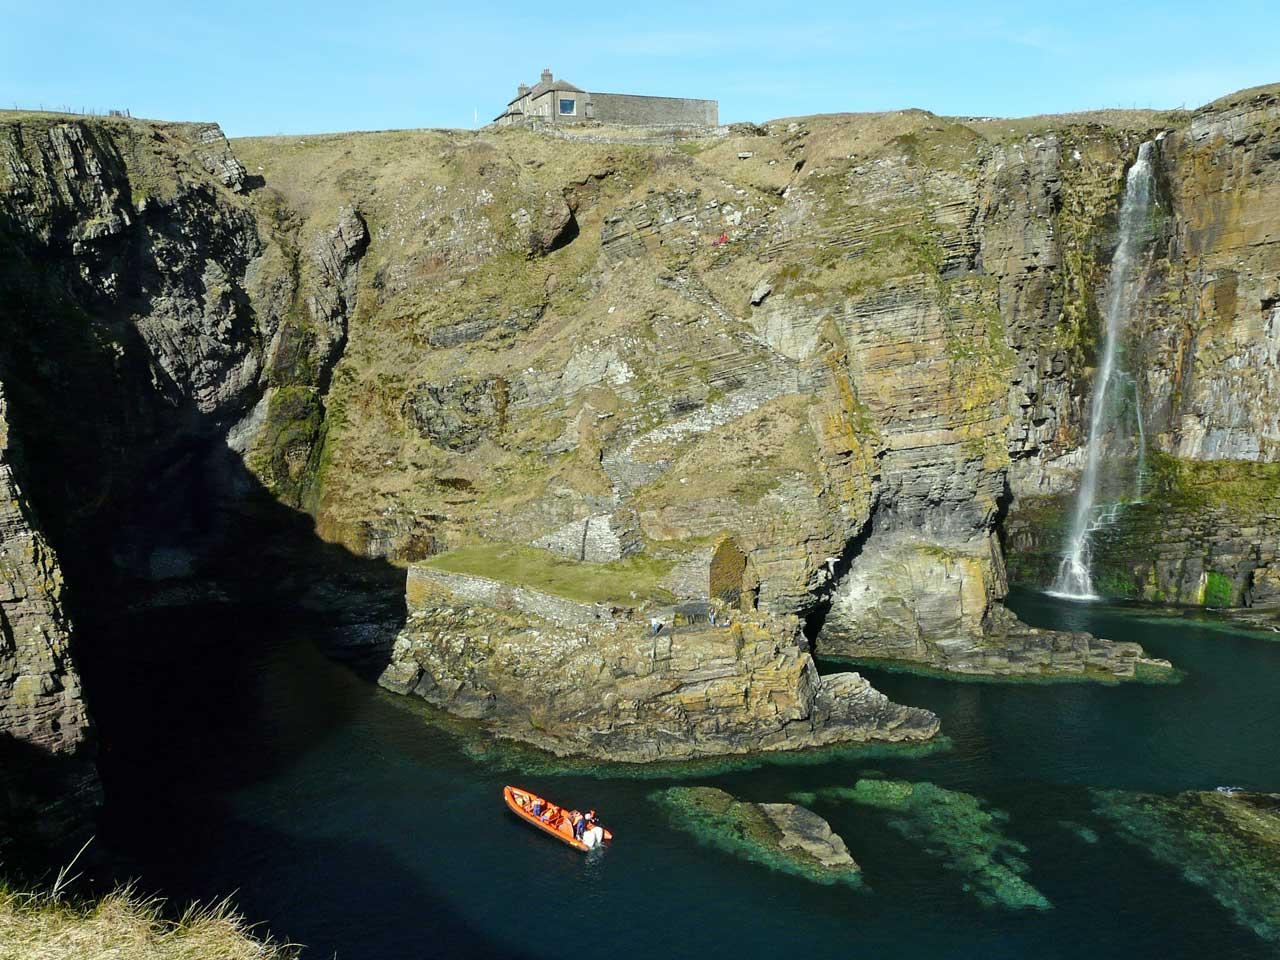 Photo: Caithness Seacoast Adventure Tours 2017 Season